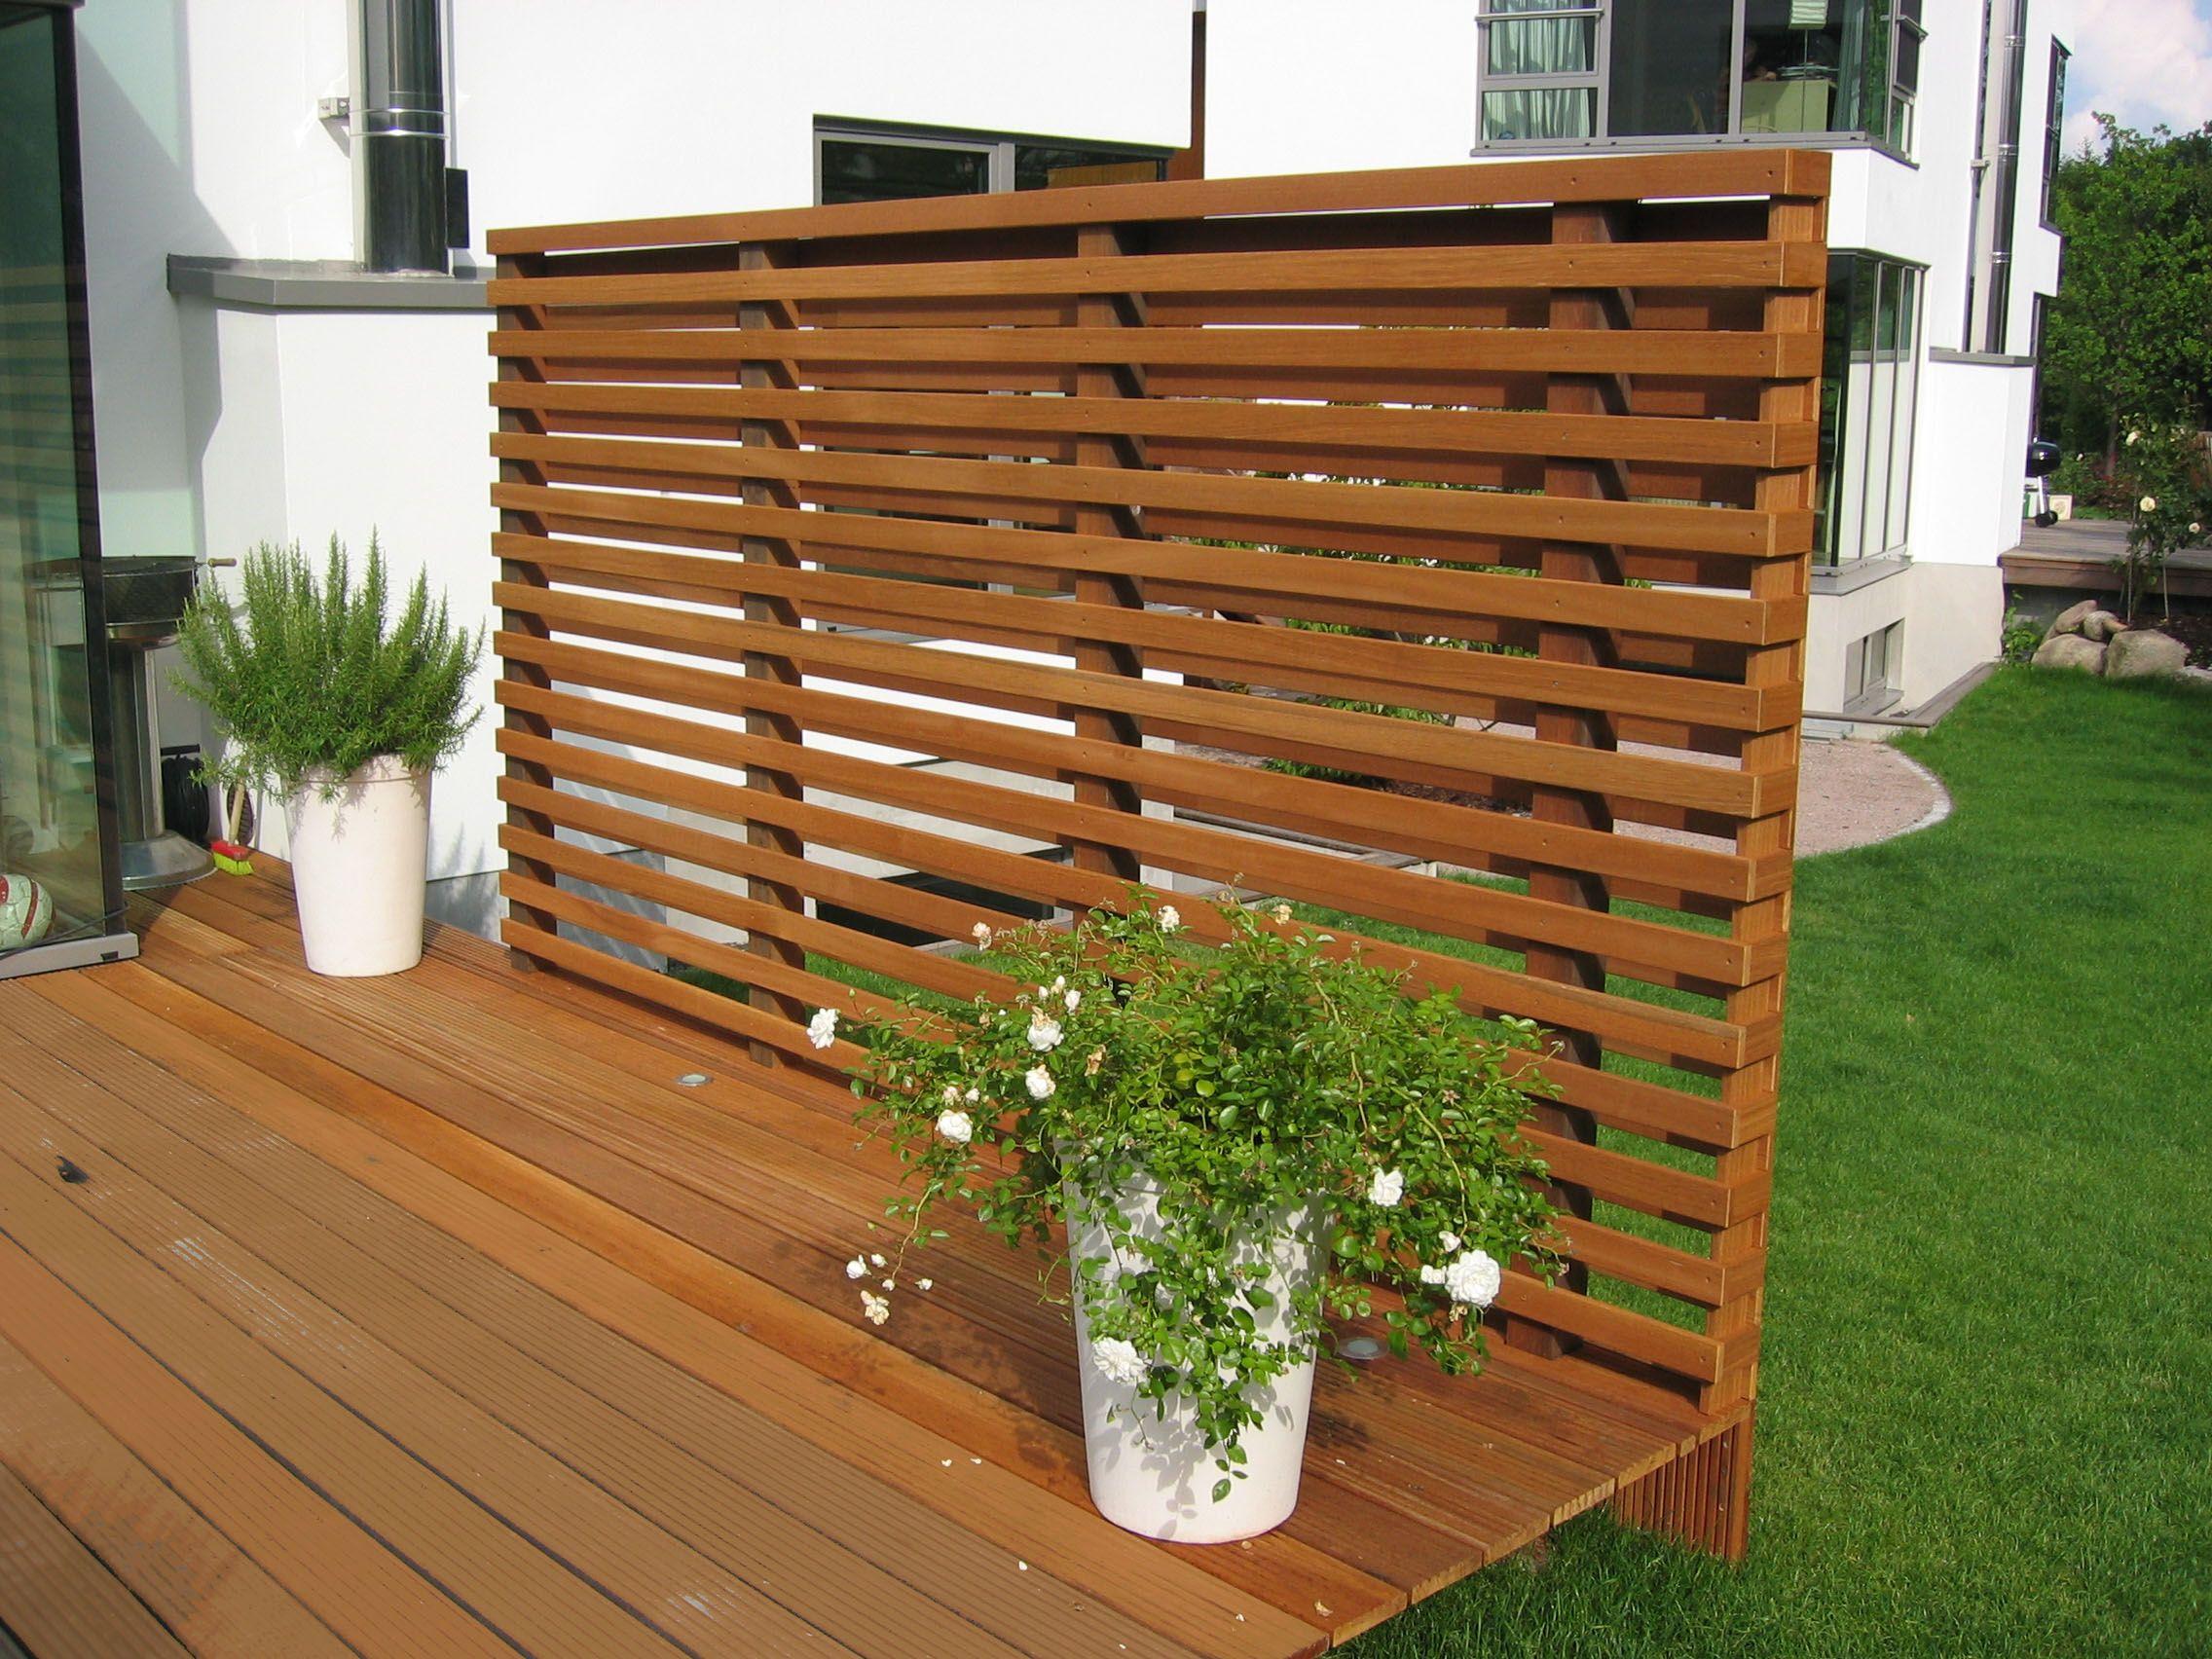 terrassen gartenideen. Black Bedroom Furniture Sets. Home Design Ideas